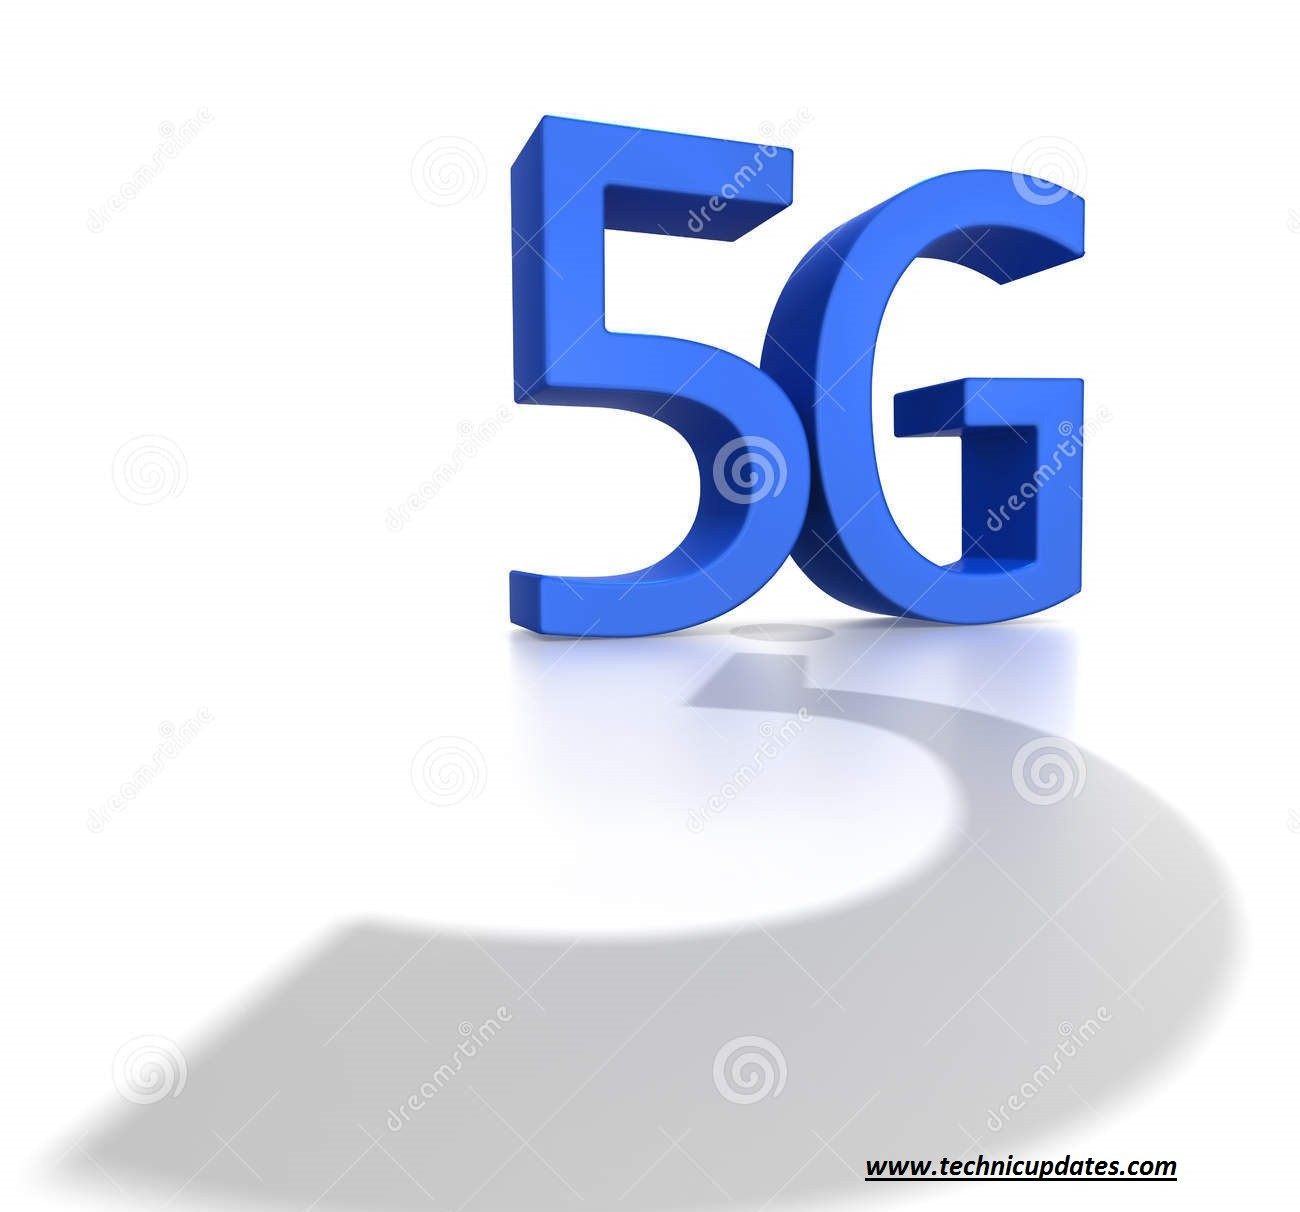 Стандарт 5G запустят в КНР с2020 года